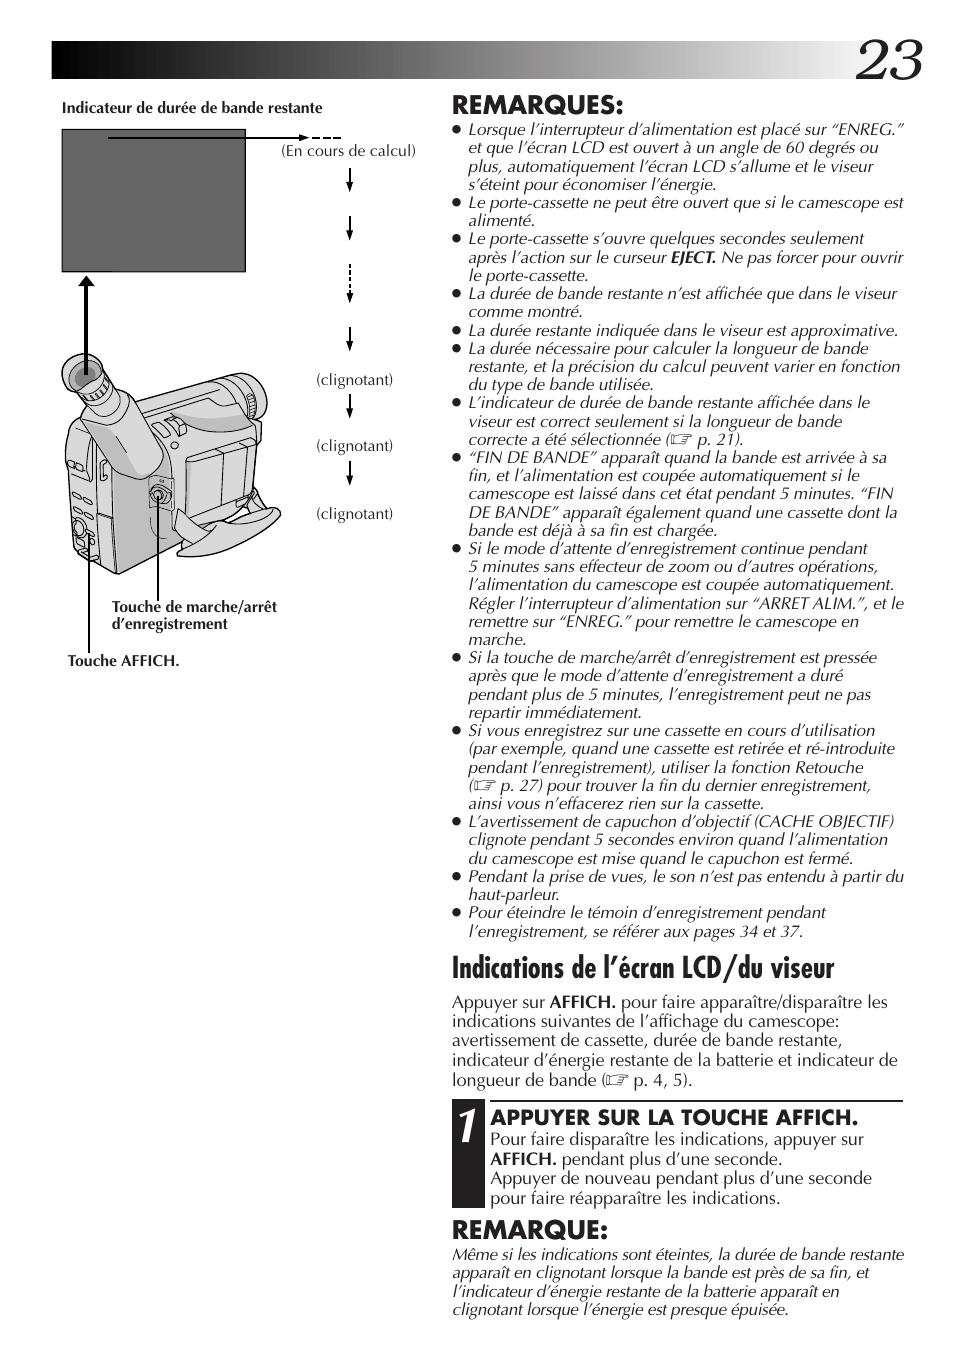 Indications de l'écran lcd/du viseur, Remarques, Remarque